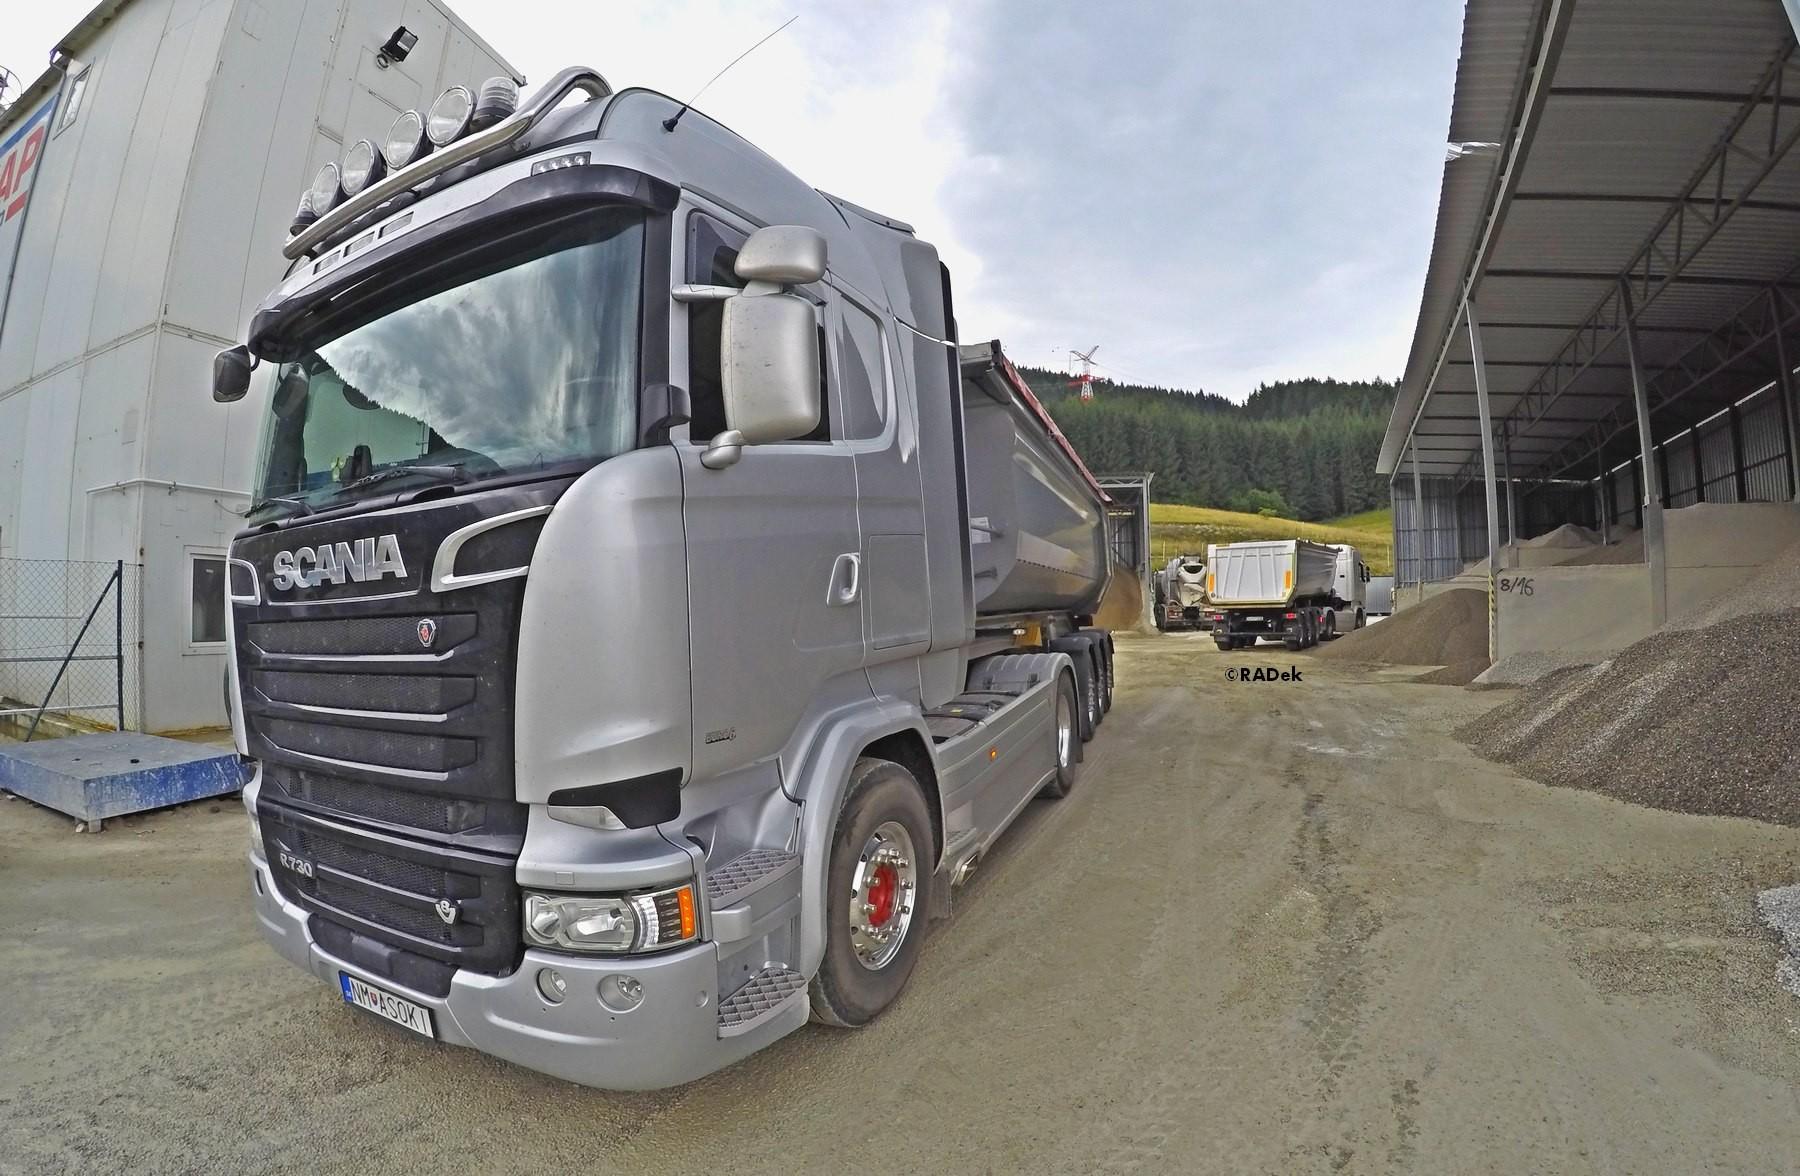 Scania Baufahrzeuge - Seite 45 - SCANIA - Baumaschinen & Bau Forum